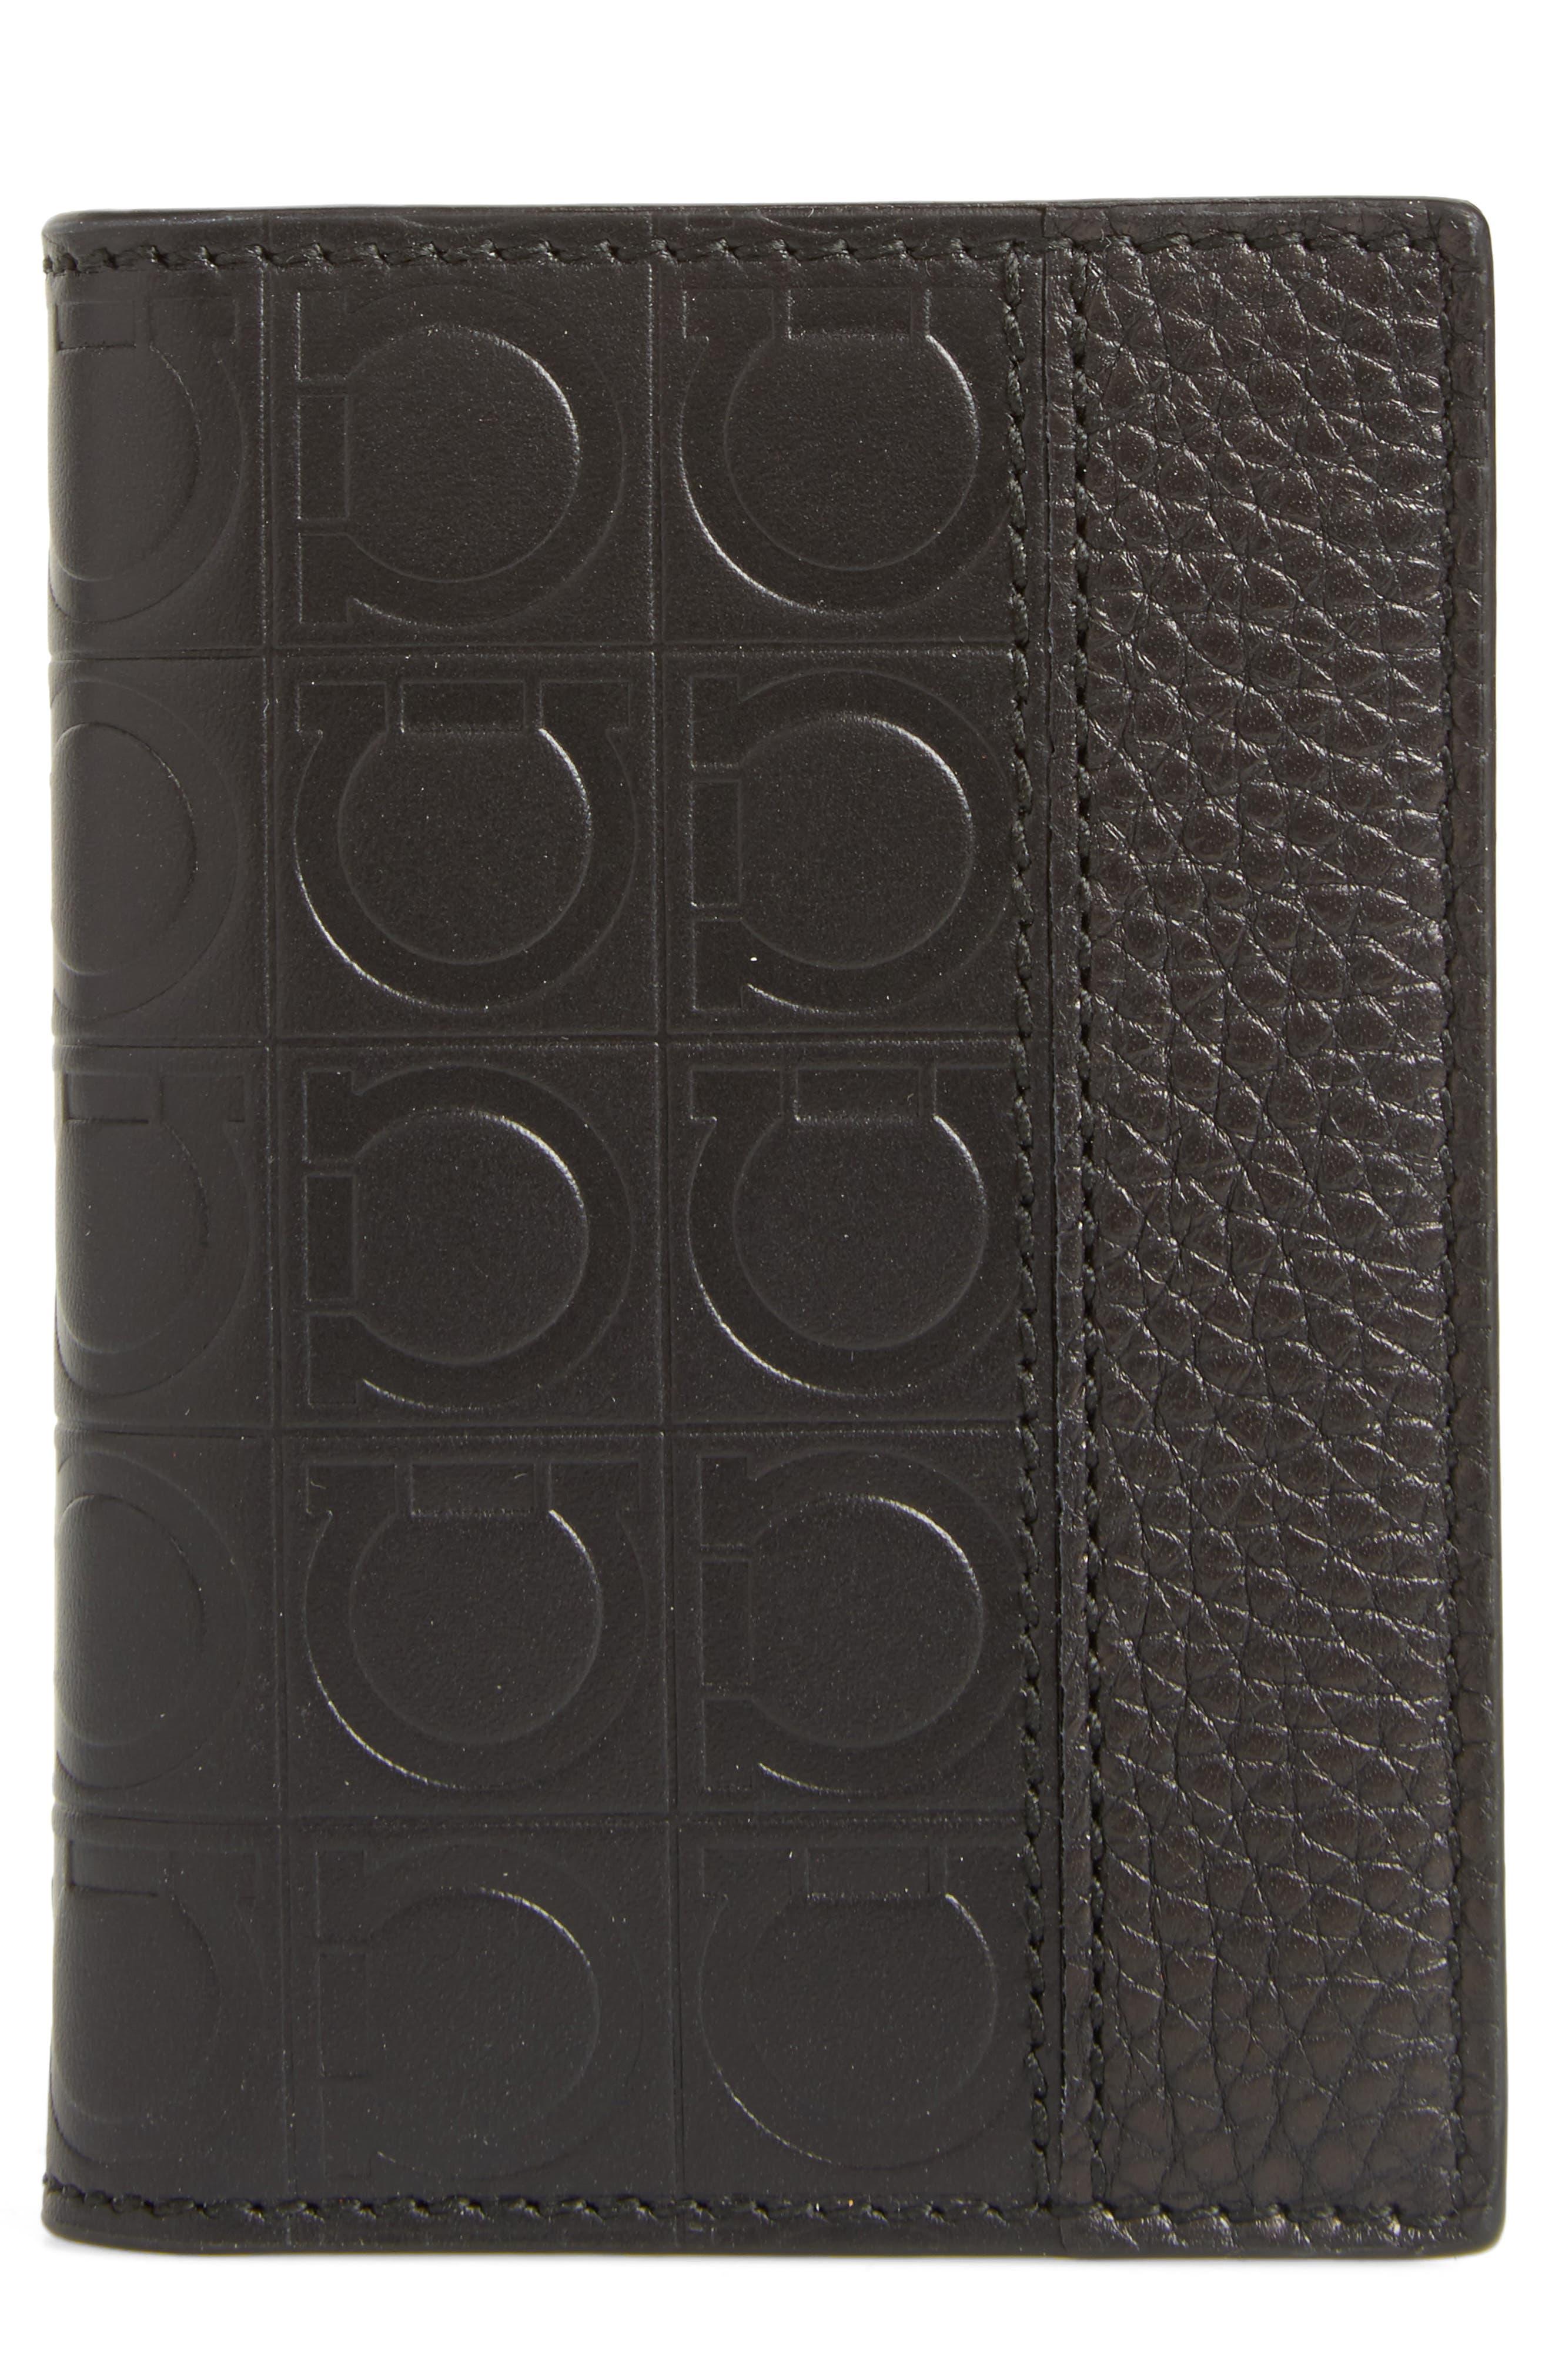 Firenze Leather Folding Card Case,                         Main,                         color, Black